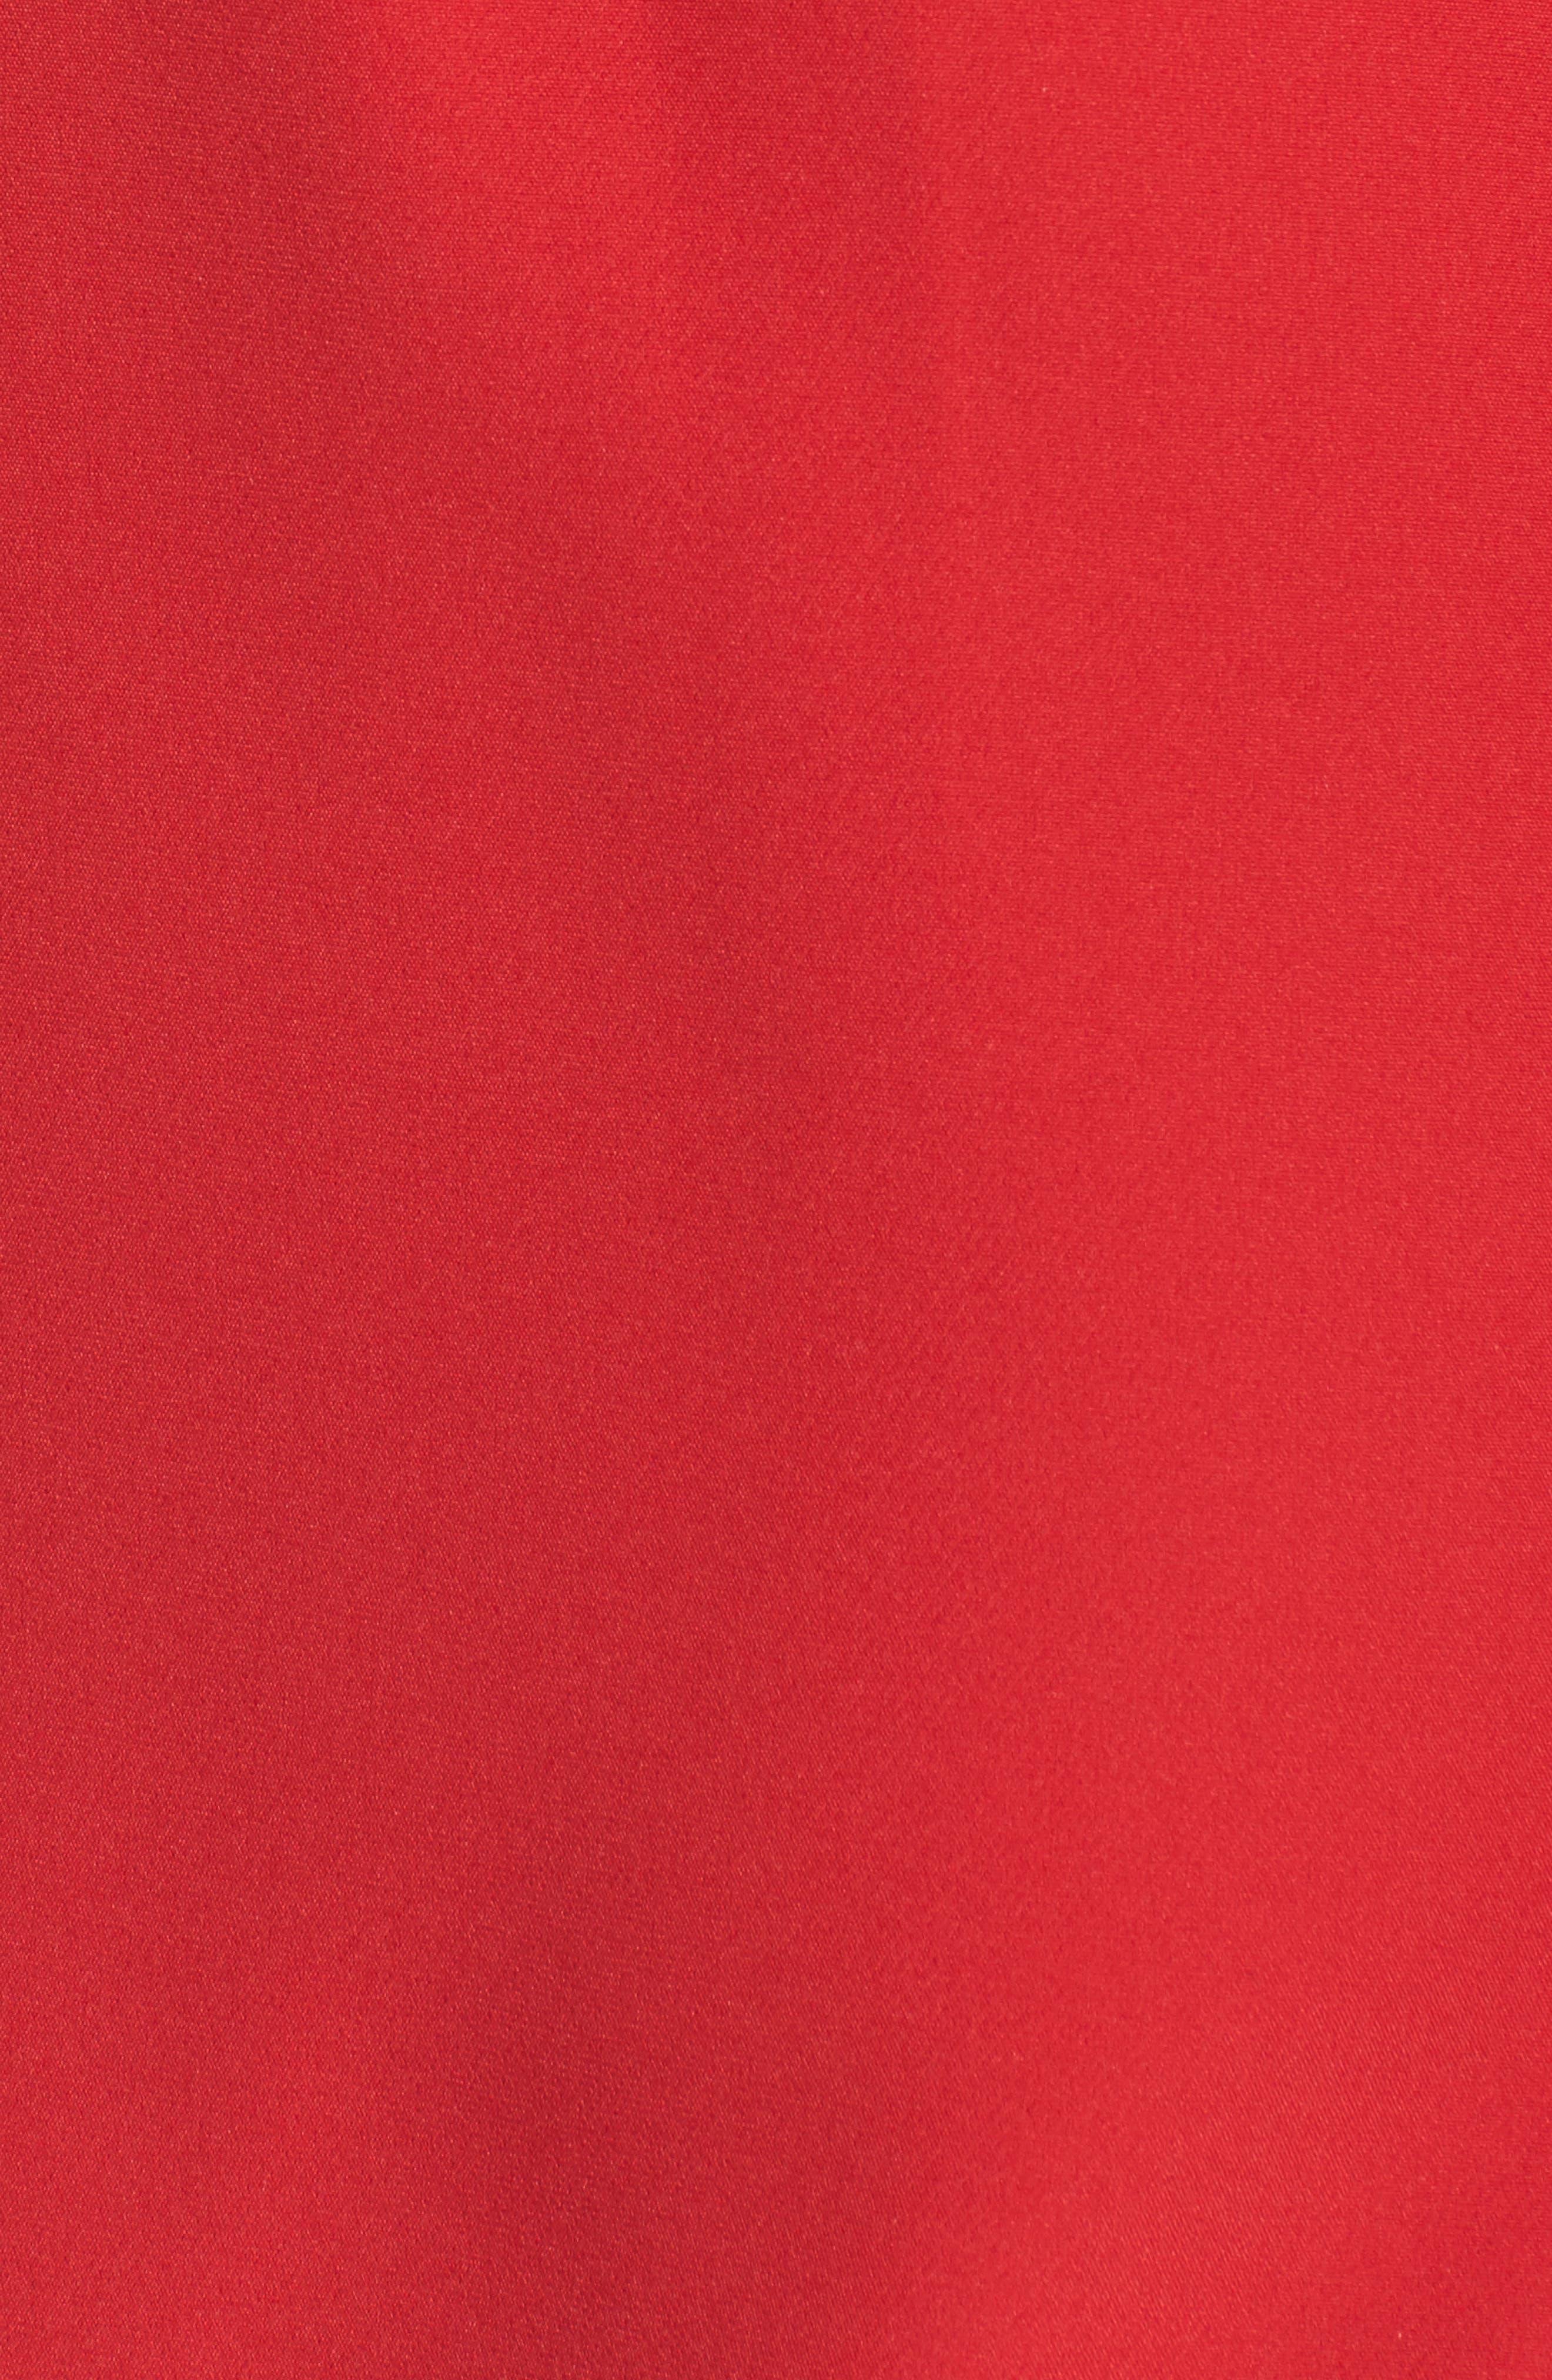 Aurora Rose Crepe Popover Dress,                             Alternate thumbnail 4, color,                             Red Barberry